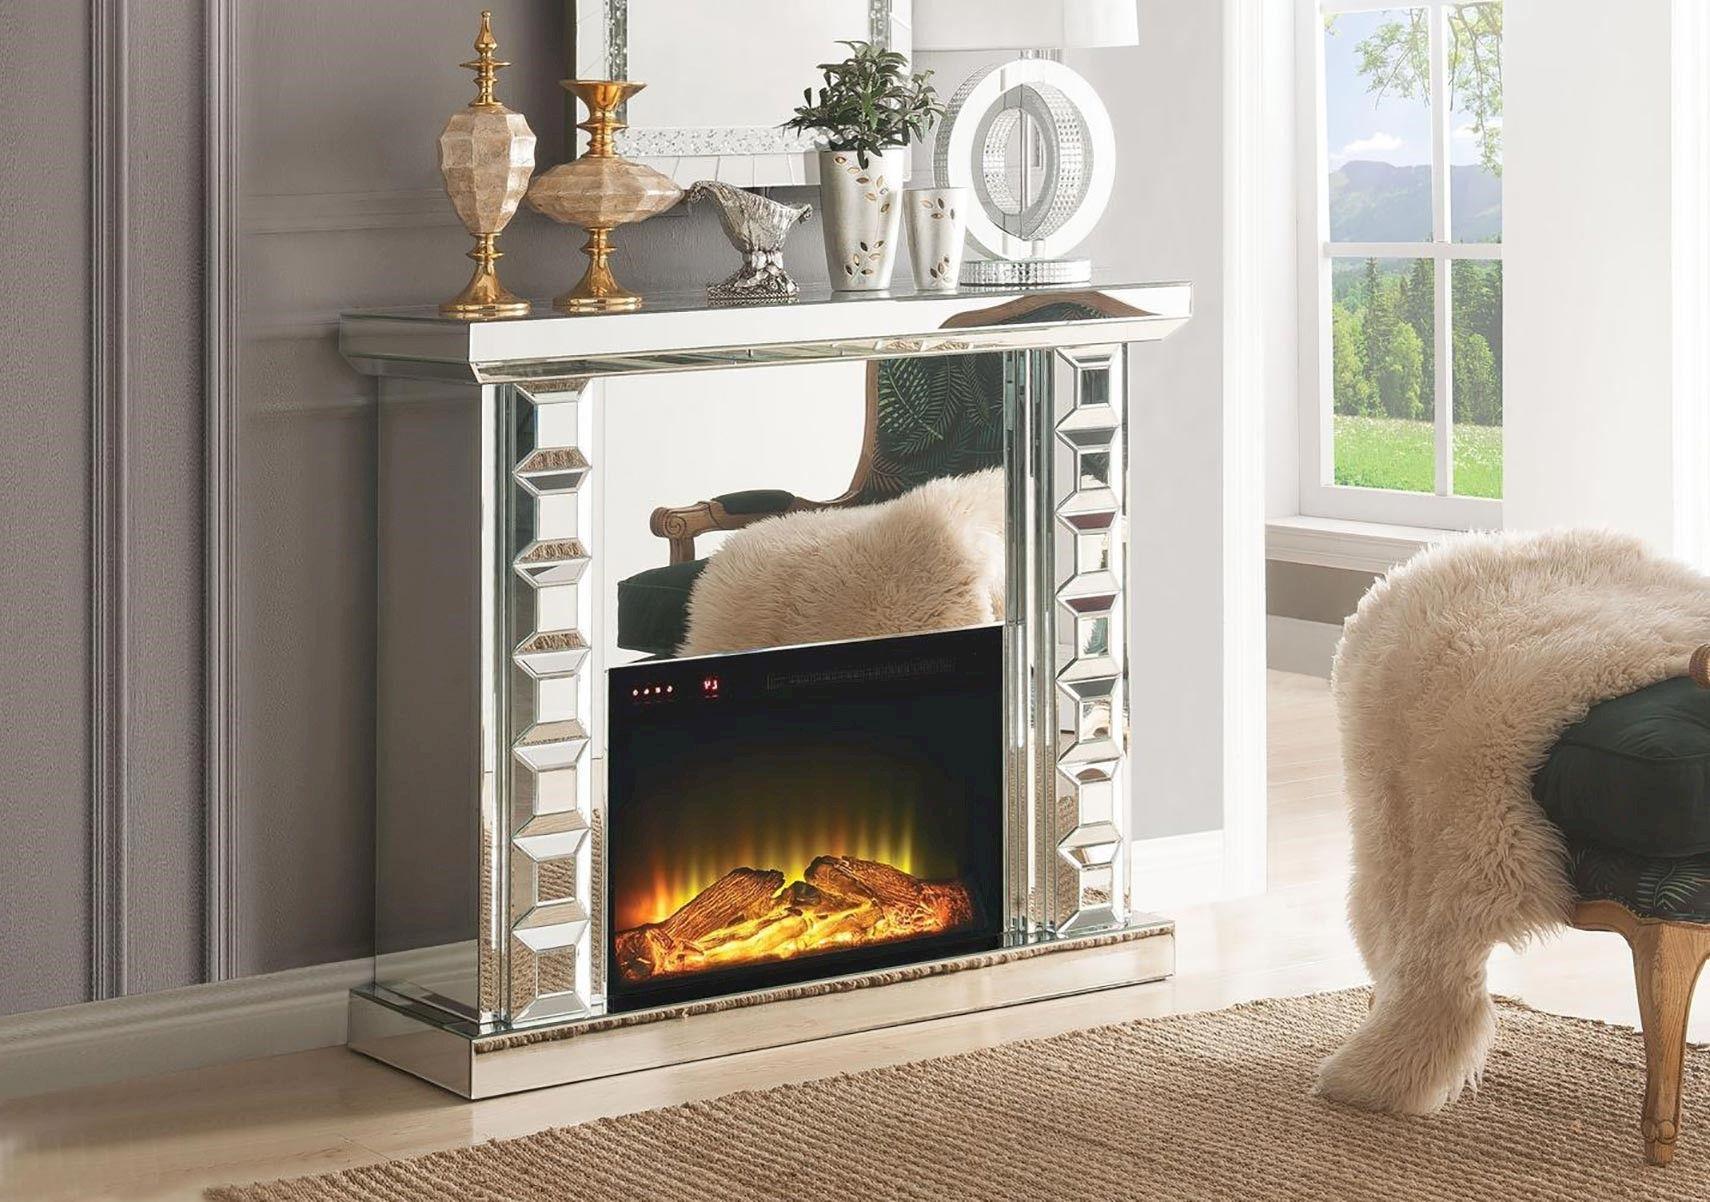 Lacks Dominic Mirrored Fireplace Acme Furniture Twin Bedroom